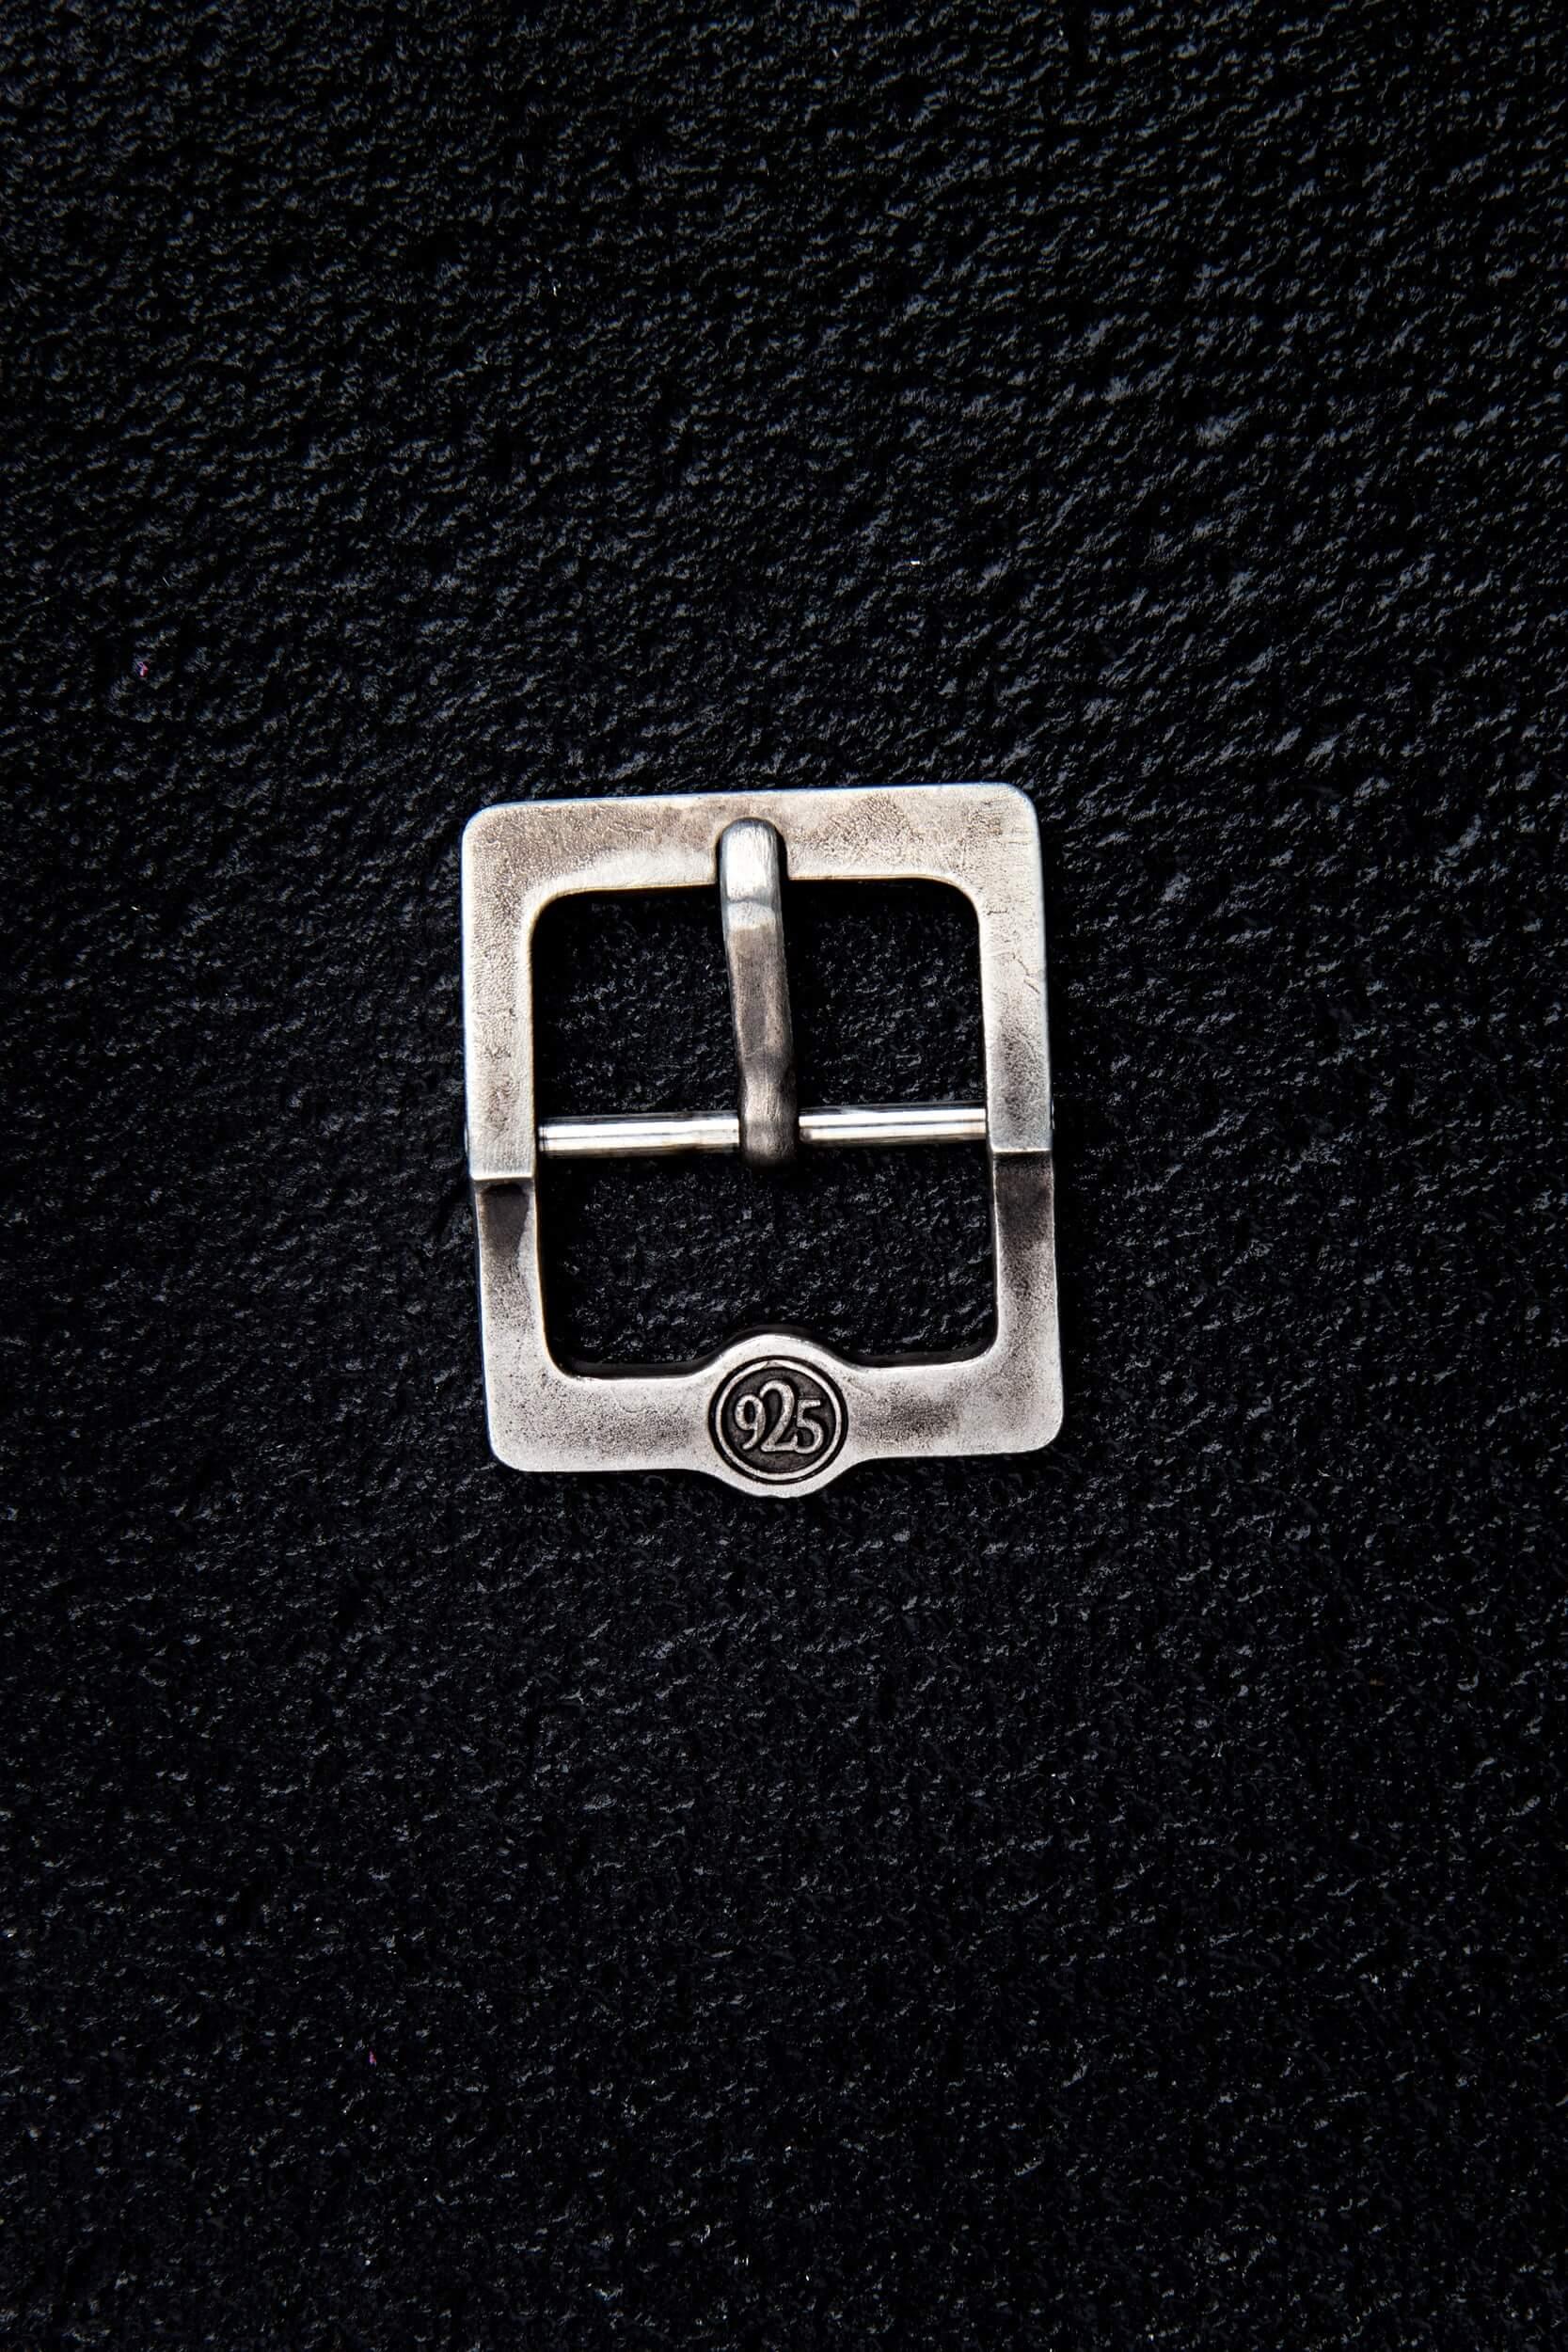 Web-crude-product-holgeraltgeld-008